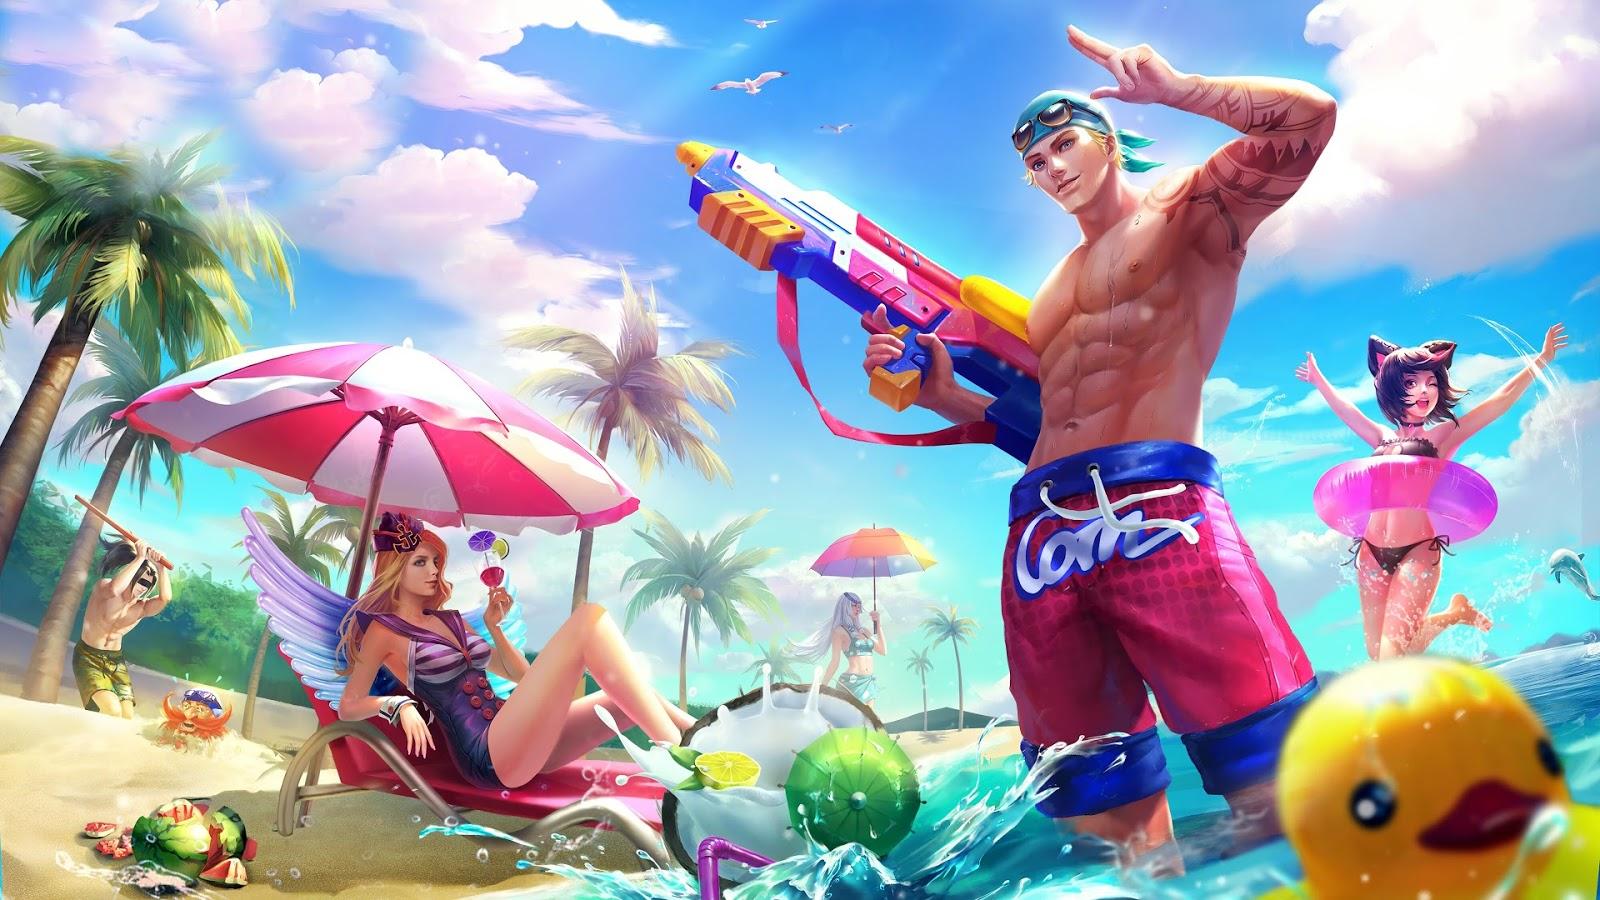 Wallpaper Clint Sun n Sand Skin Mobile Legends HD for PC